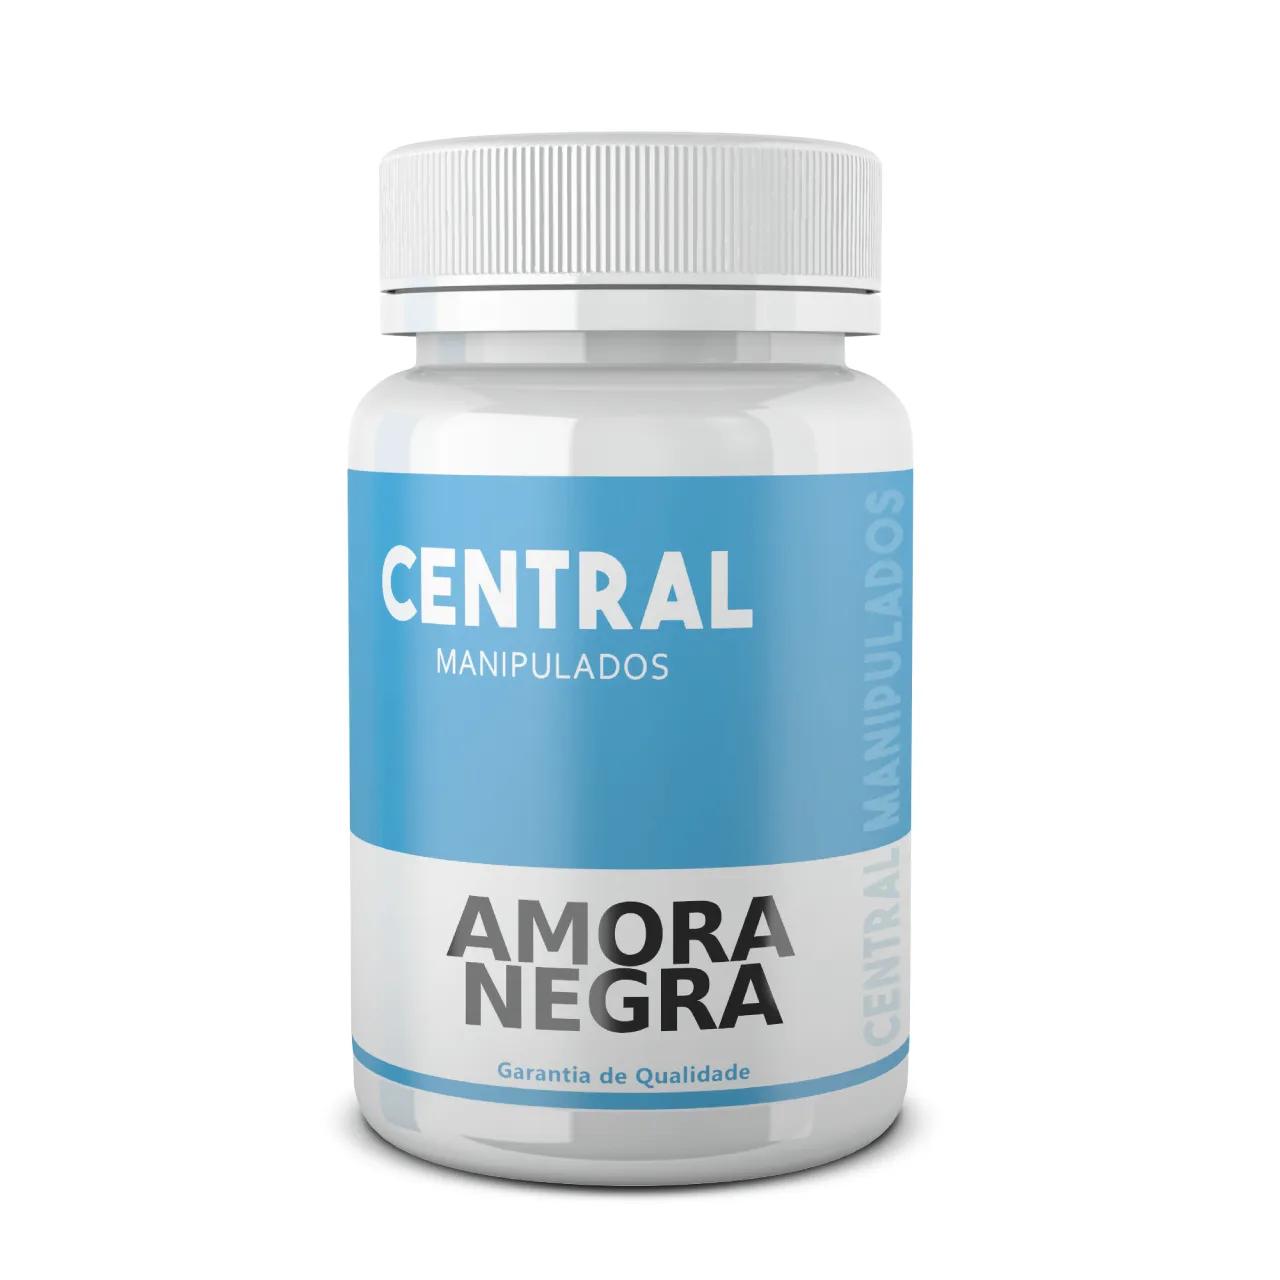 Amora Negra 500mg - 120 cápsulas - Antioxidante, Antiinflamatório, Diurético